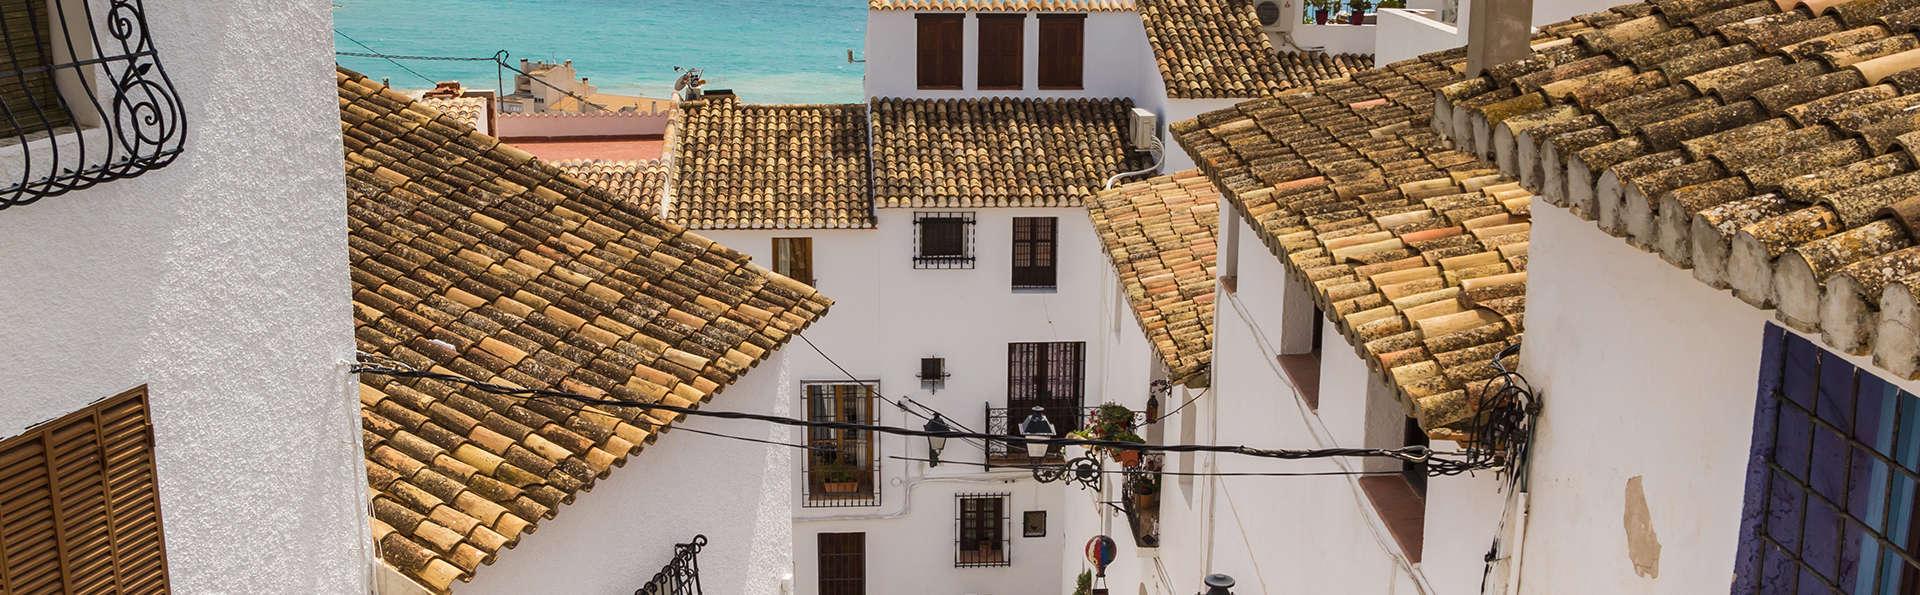 SH Villa Gadea  - Edit_Altea2.jpg